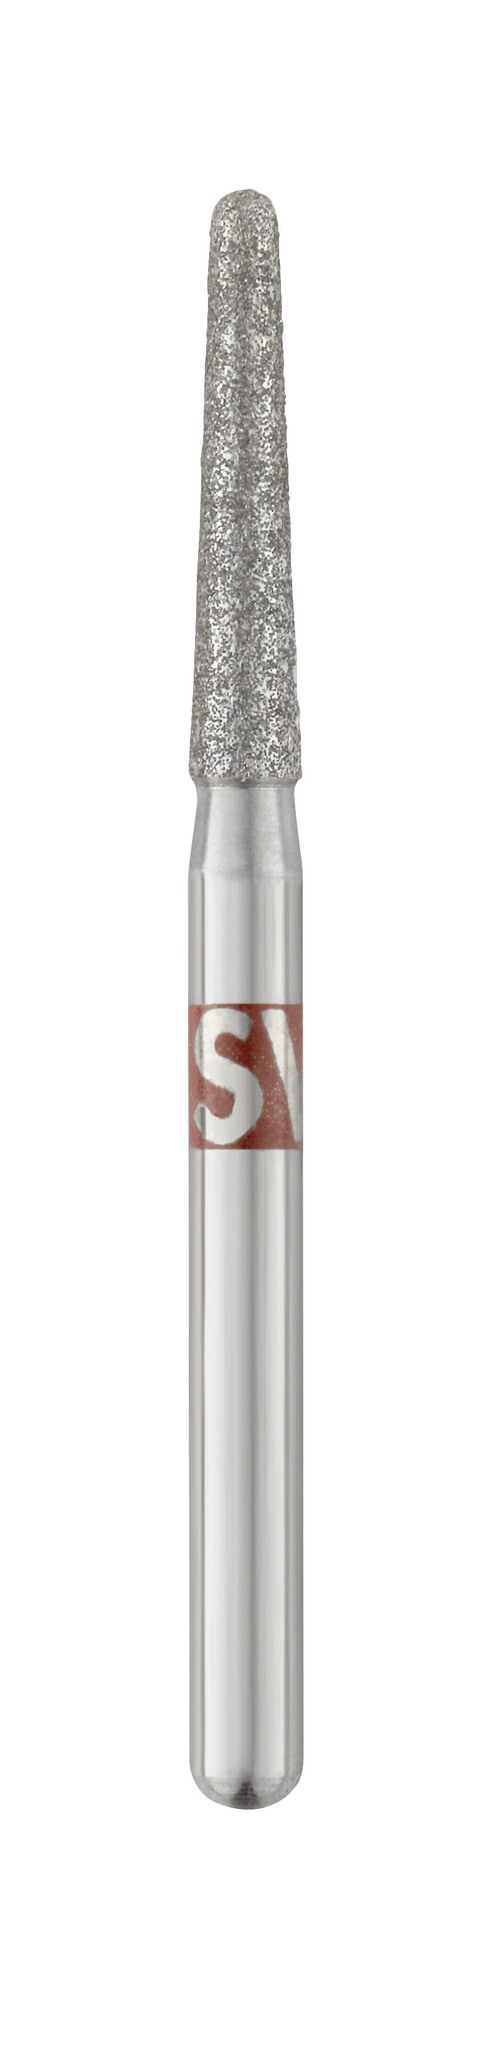 Алмазные боры «SS WHITE» серия HP 856/016